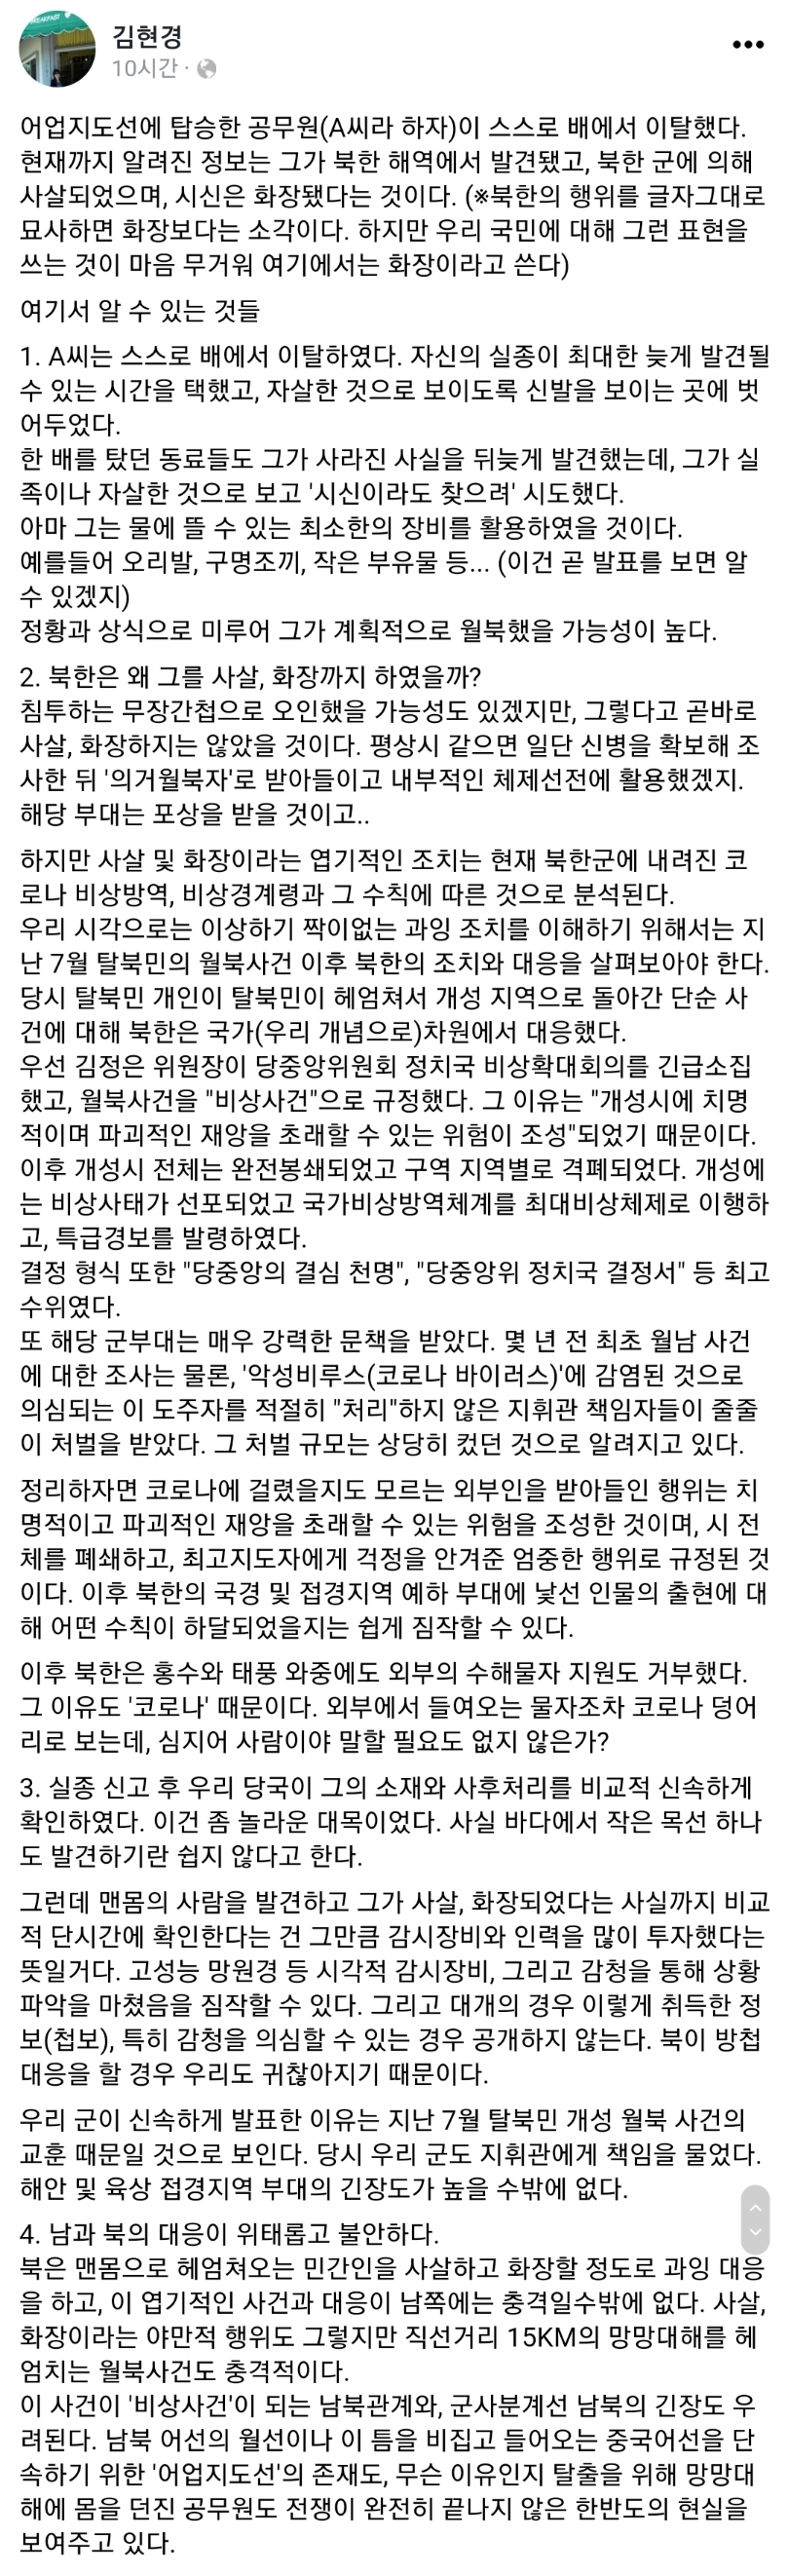 Screenshot_20200924-215122_Samsung Internet.jpg